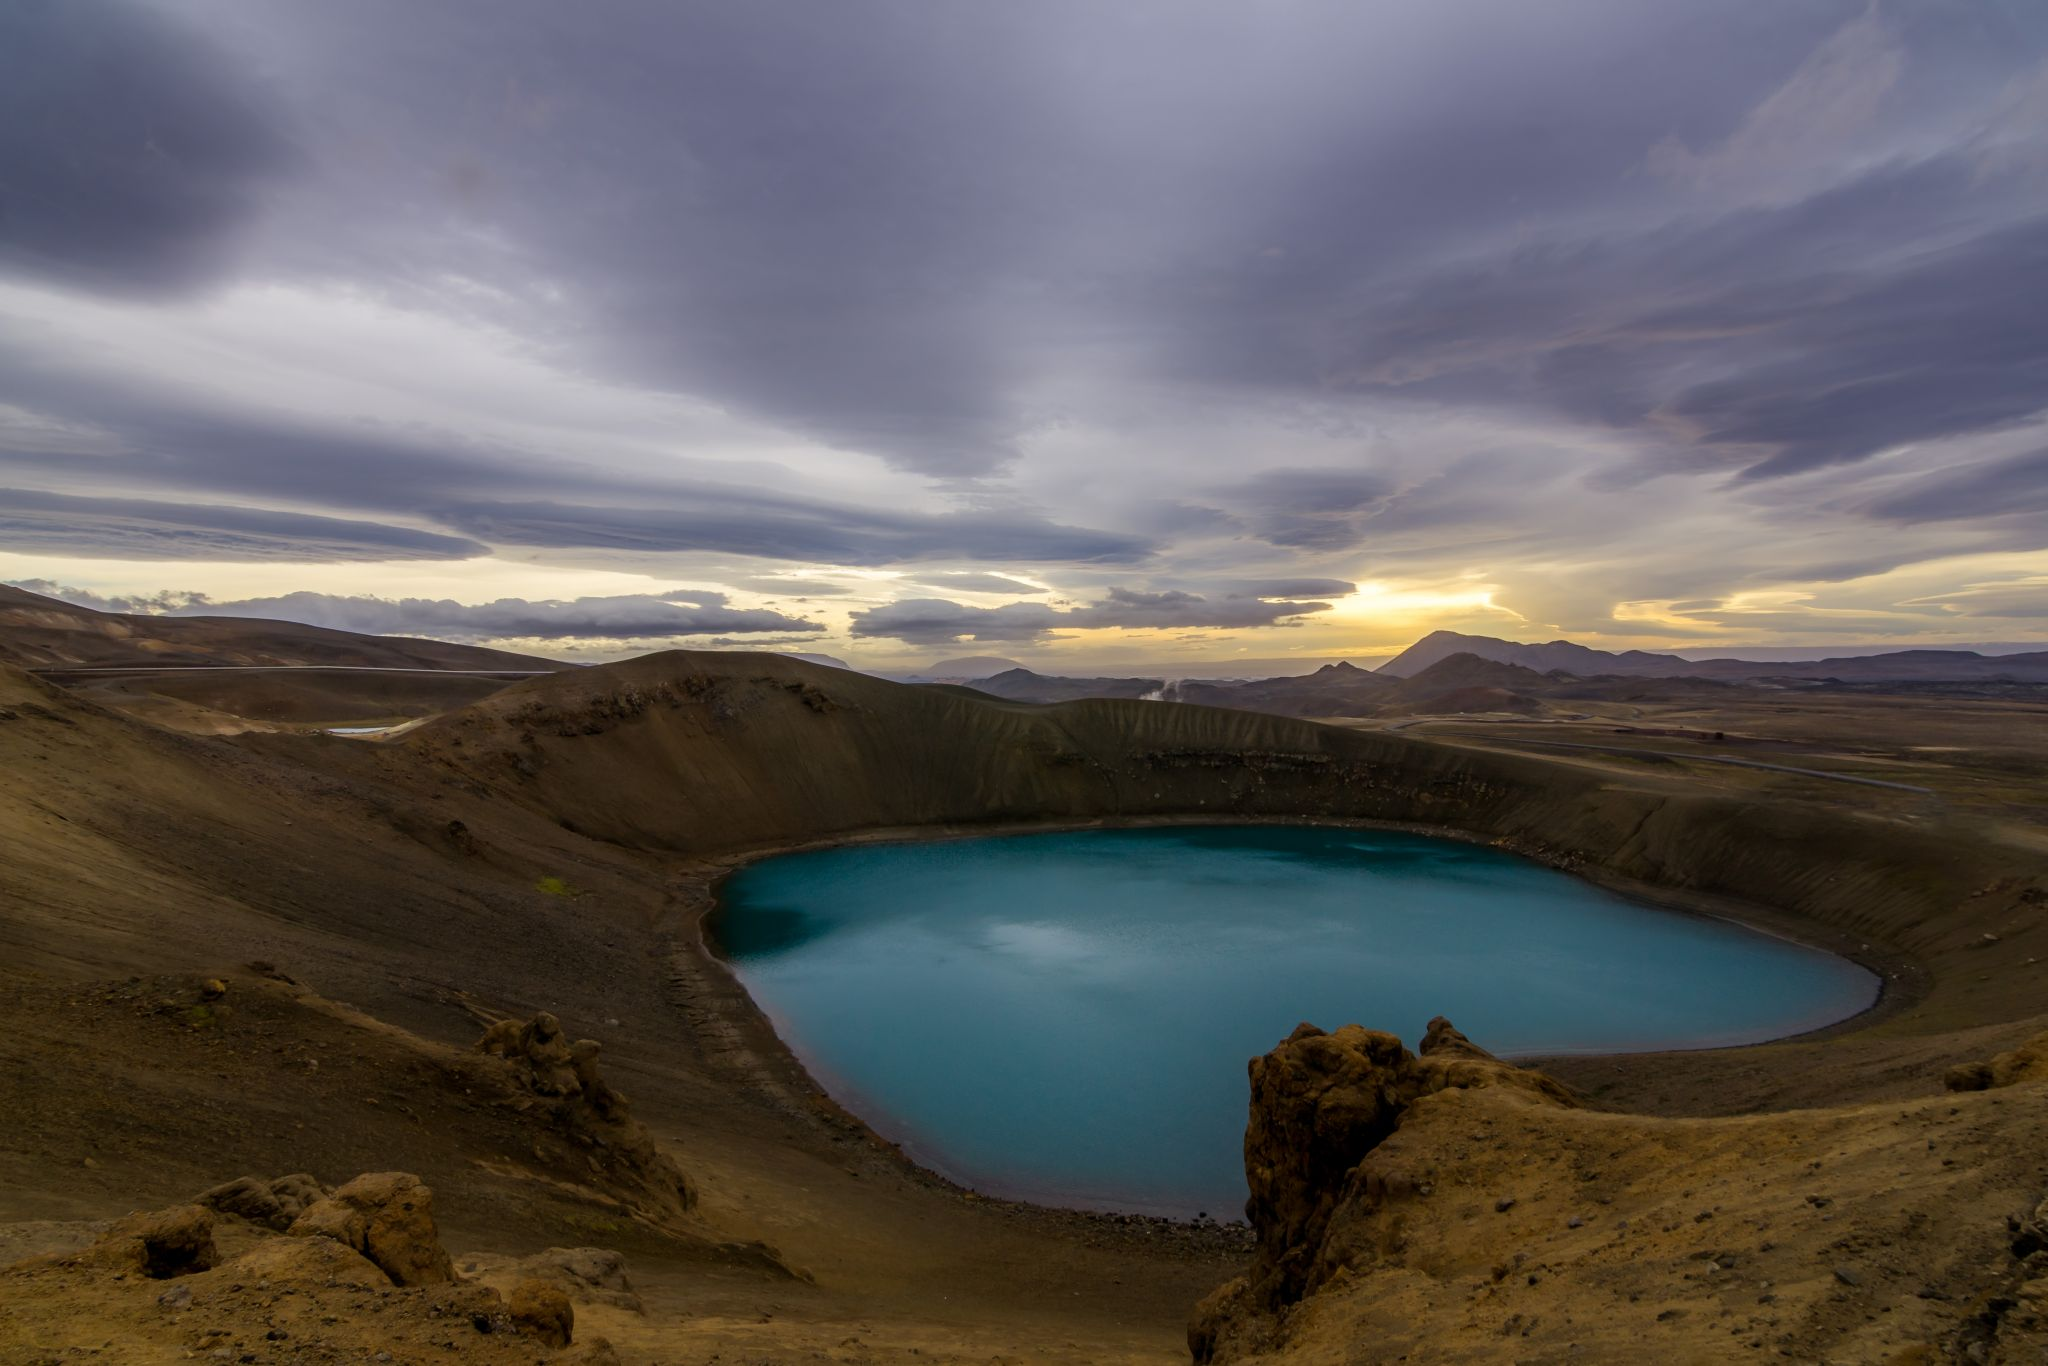 Viti explosion crater in Krafla, Iceland, Iceland